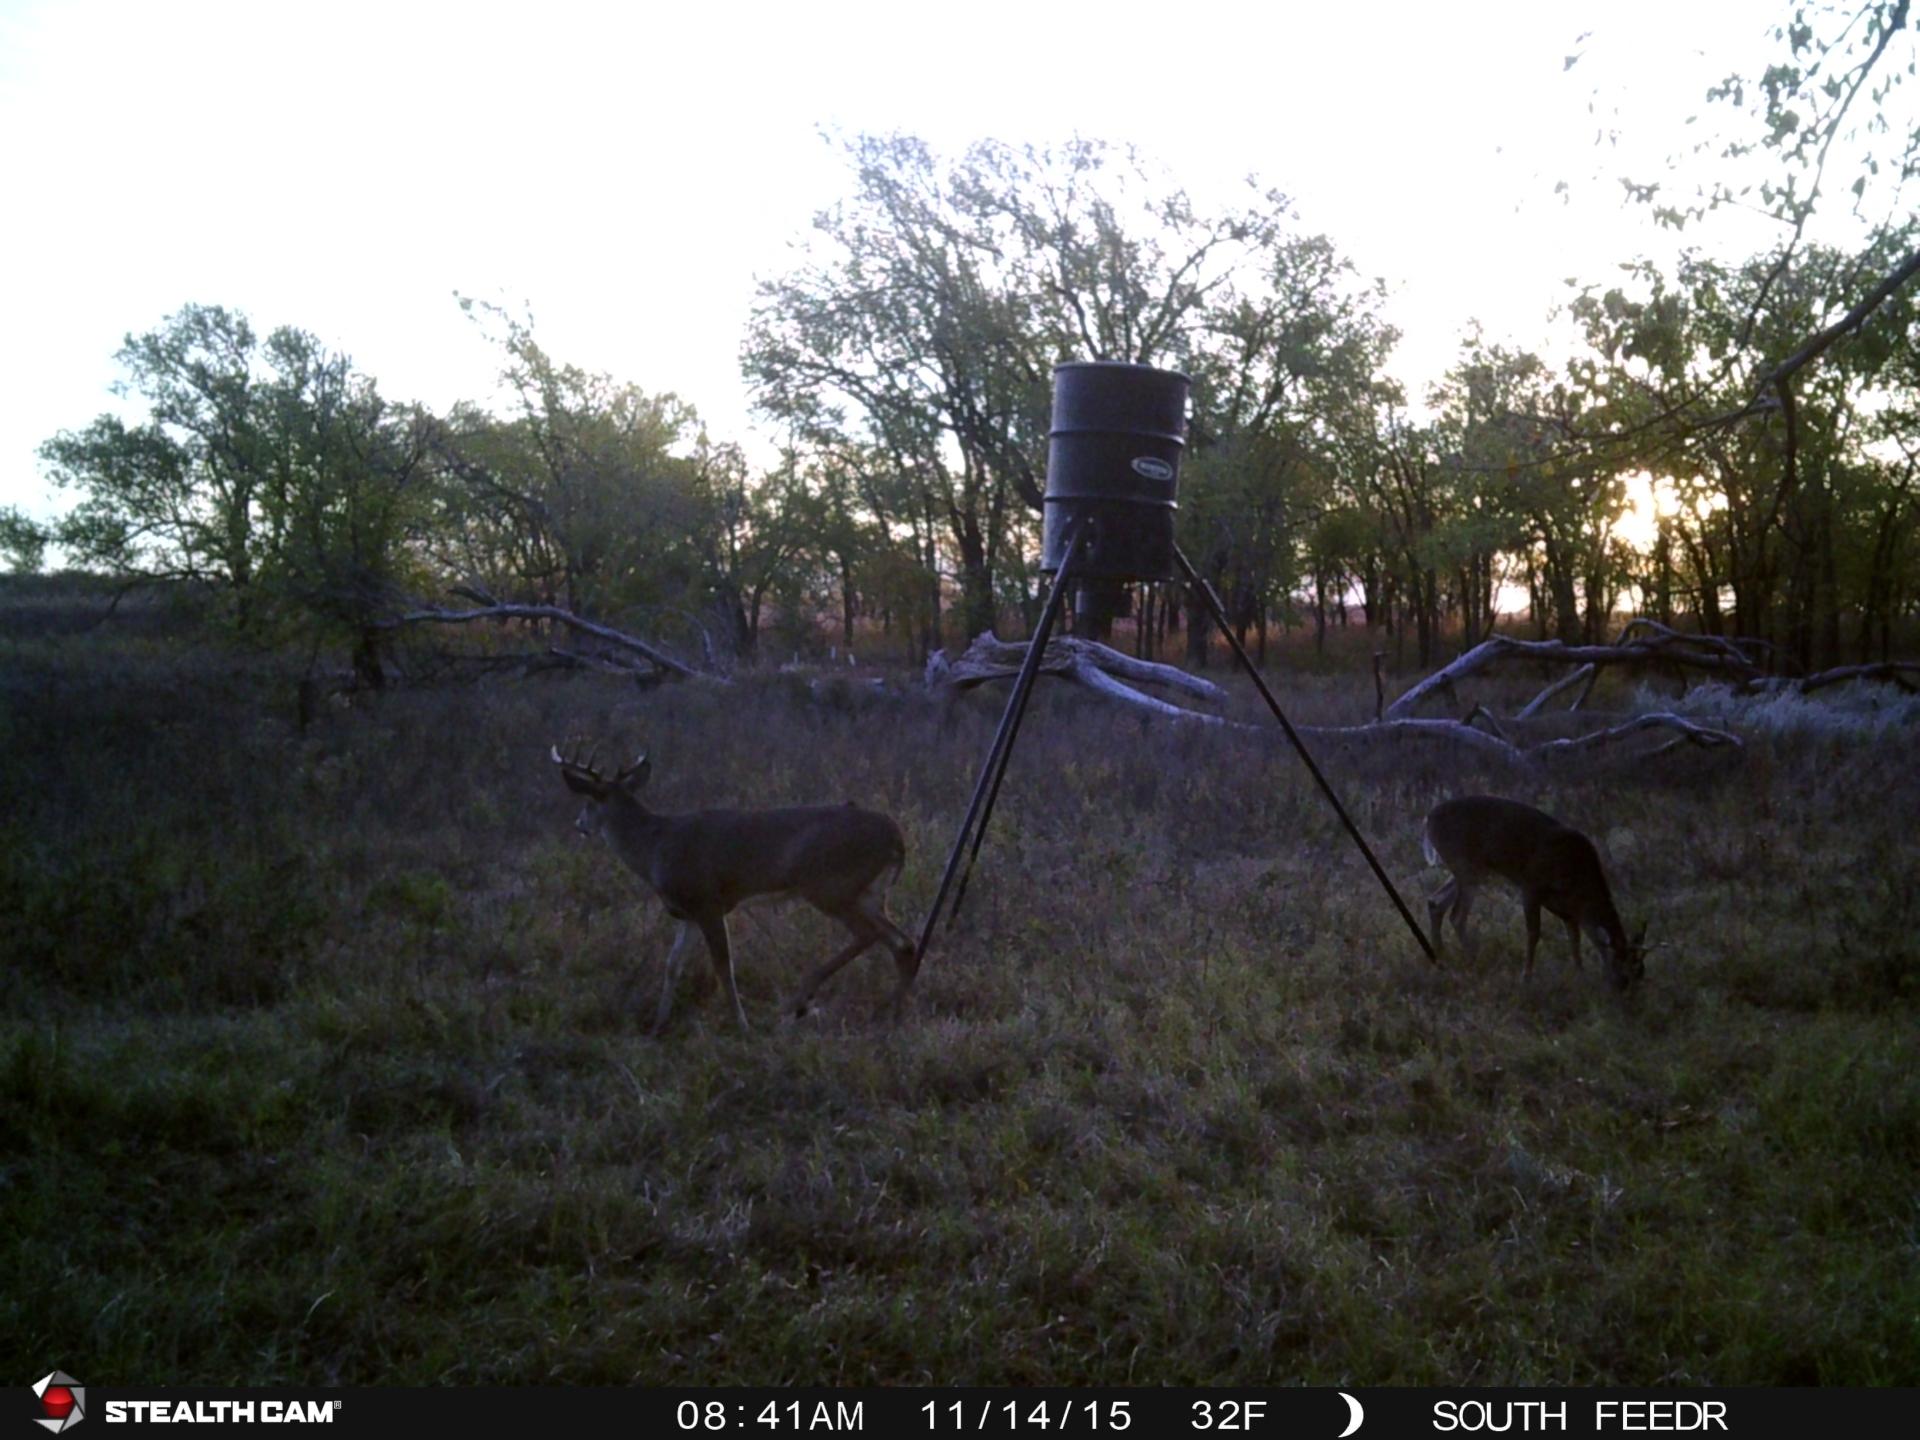 Management buck (left)